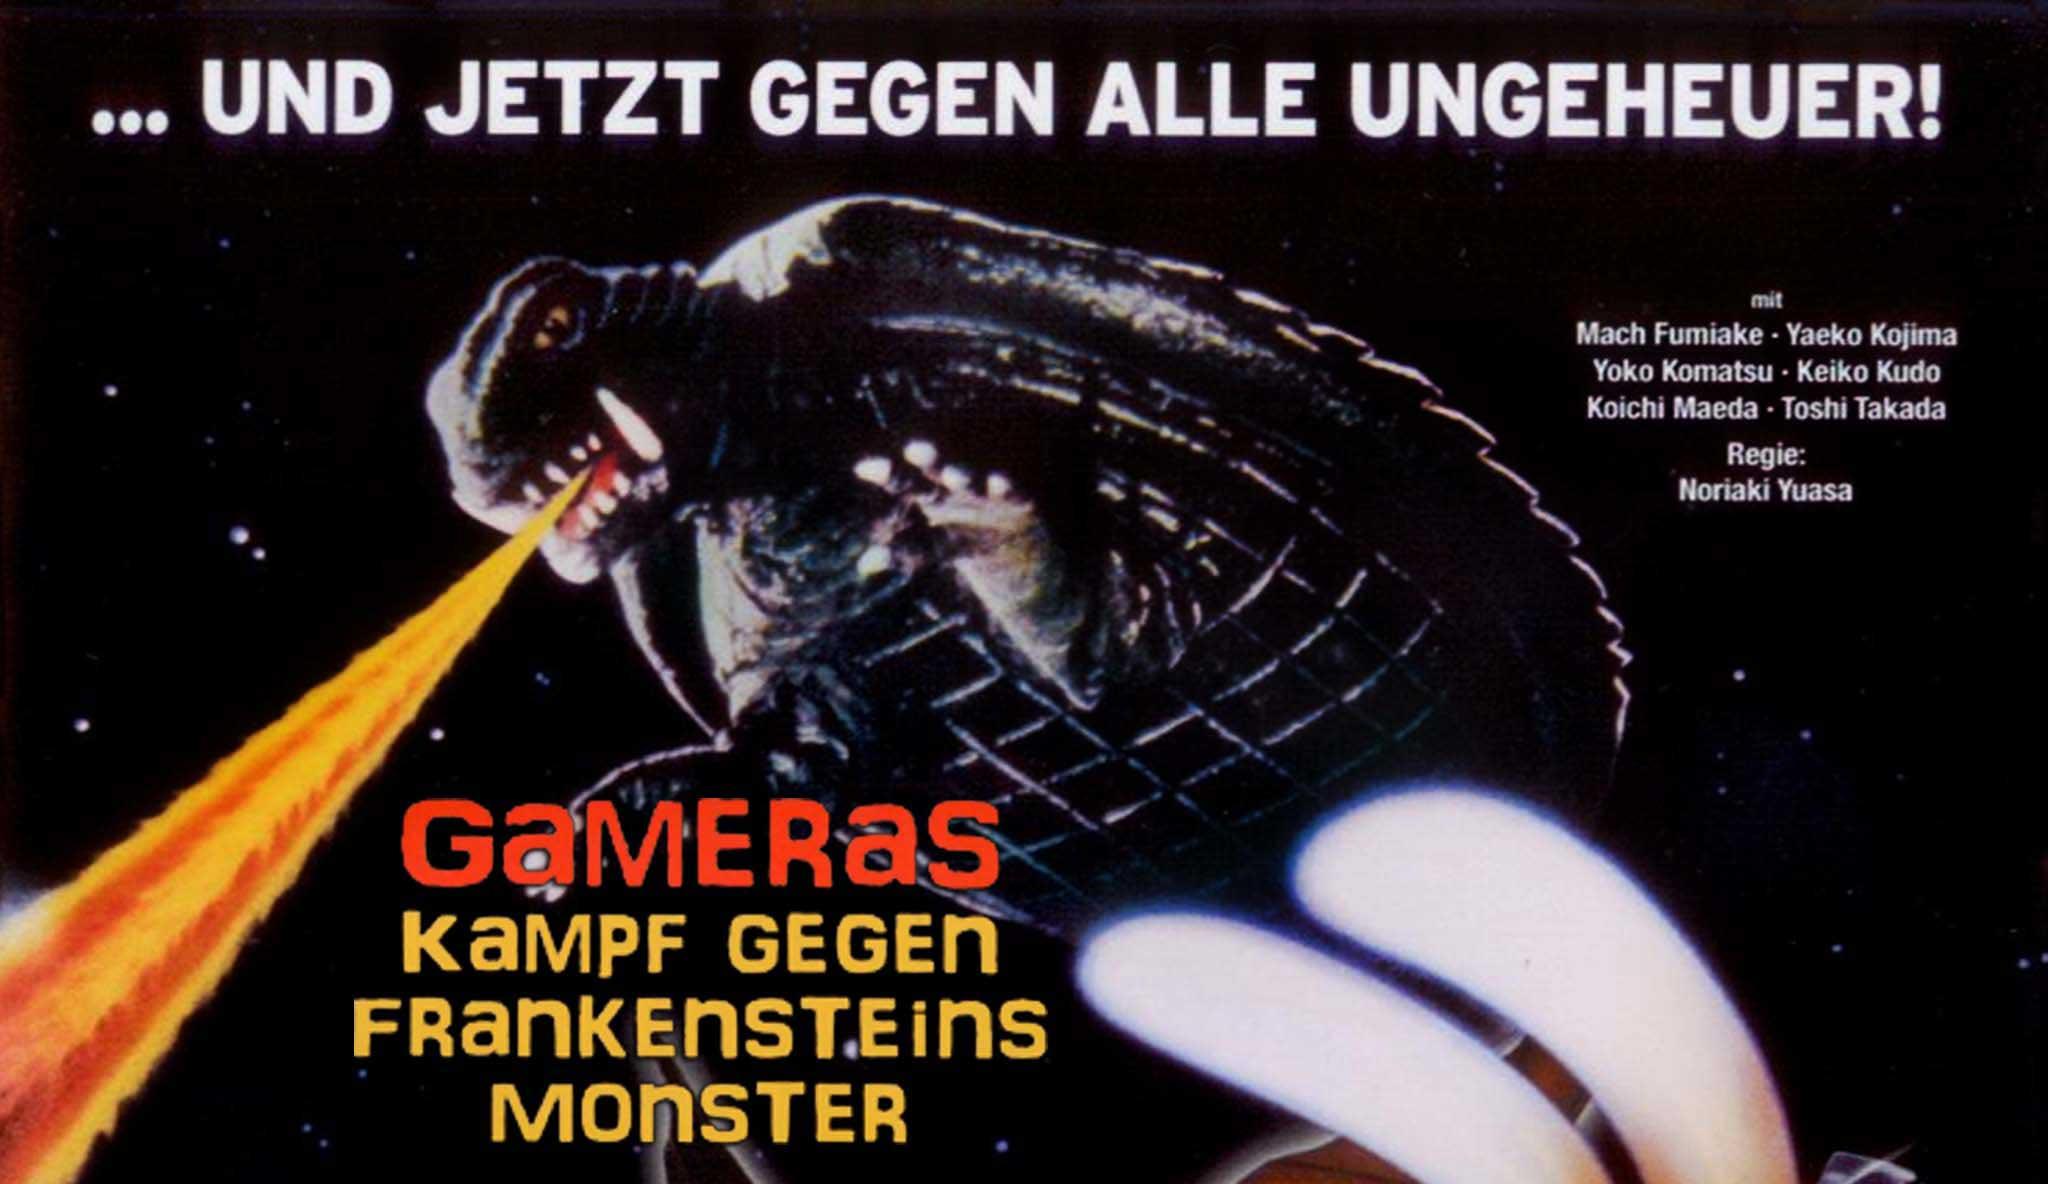 gameras-kampf-gegen-frankensteins-monster\header.jpg